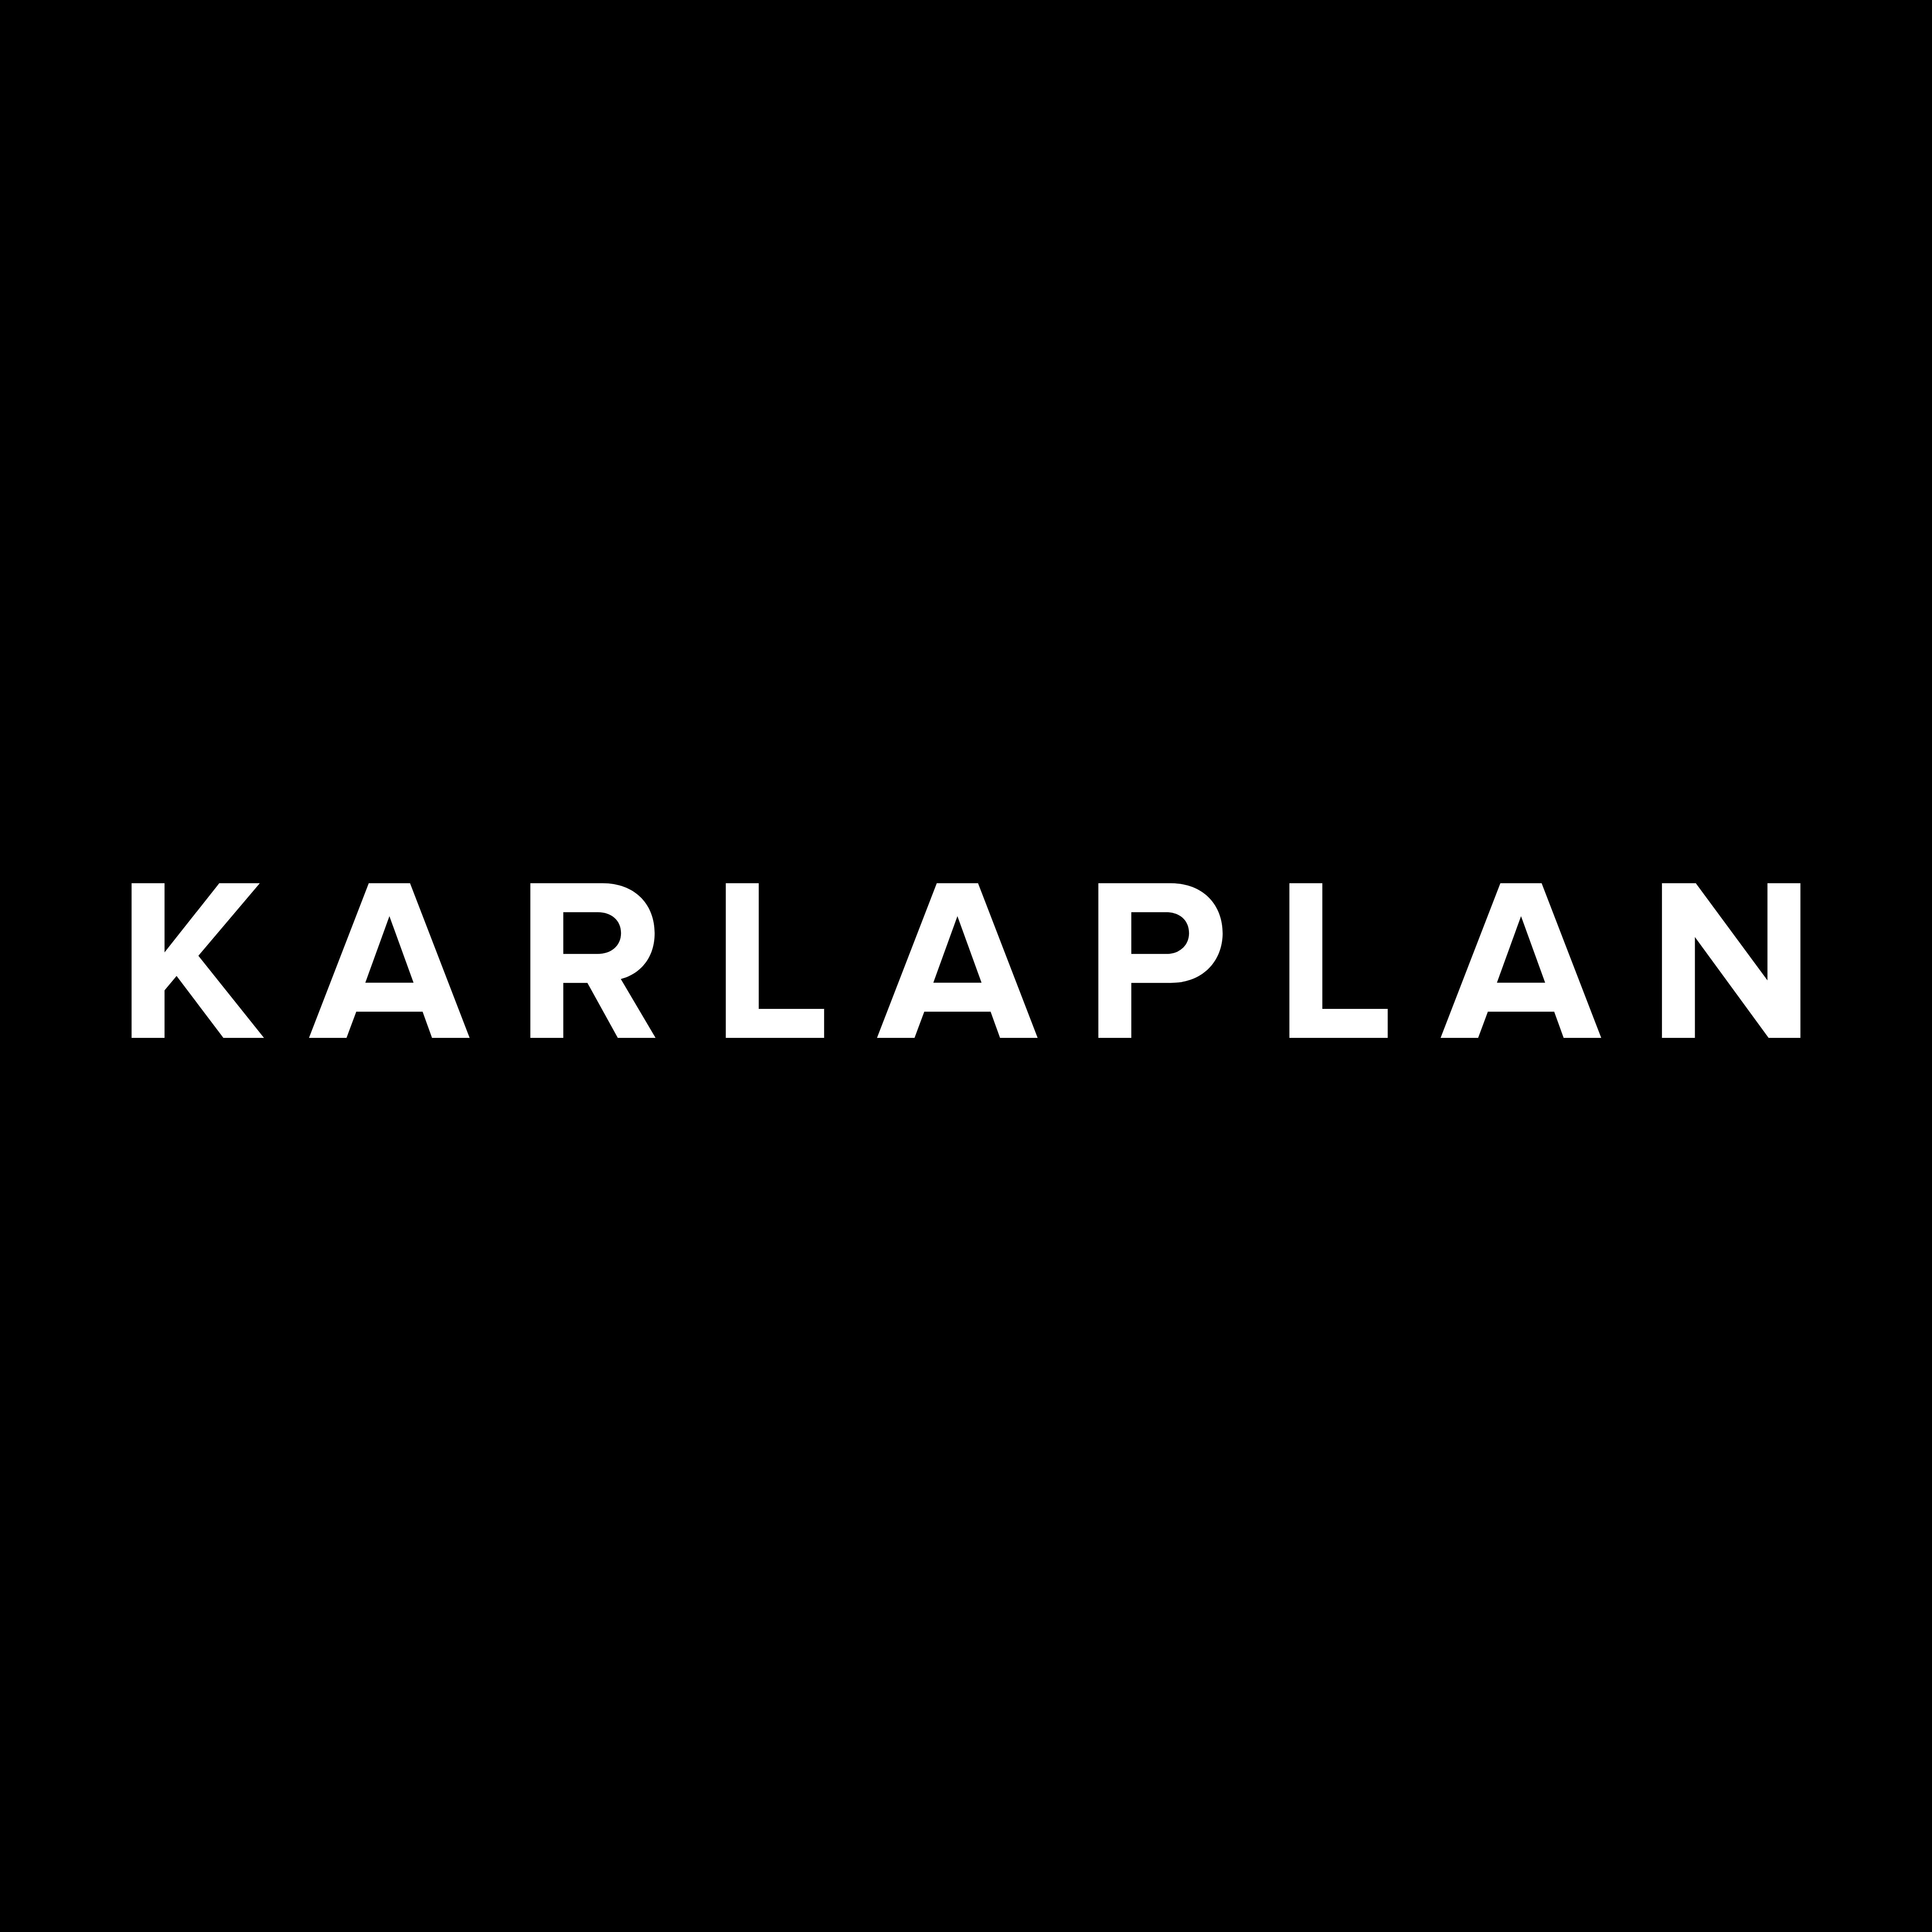 Logo Karlaplan, Östermalm, Stockholm - @karlaplan - karlaplan.com - Karlaplan en del av Östermalm - @ostermalm - ostermalm.com